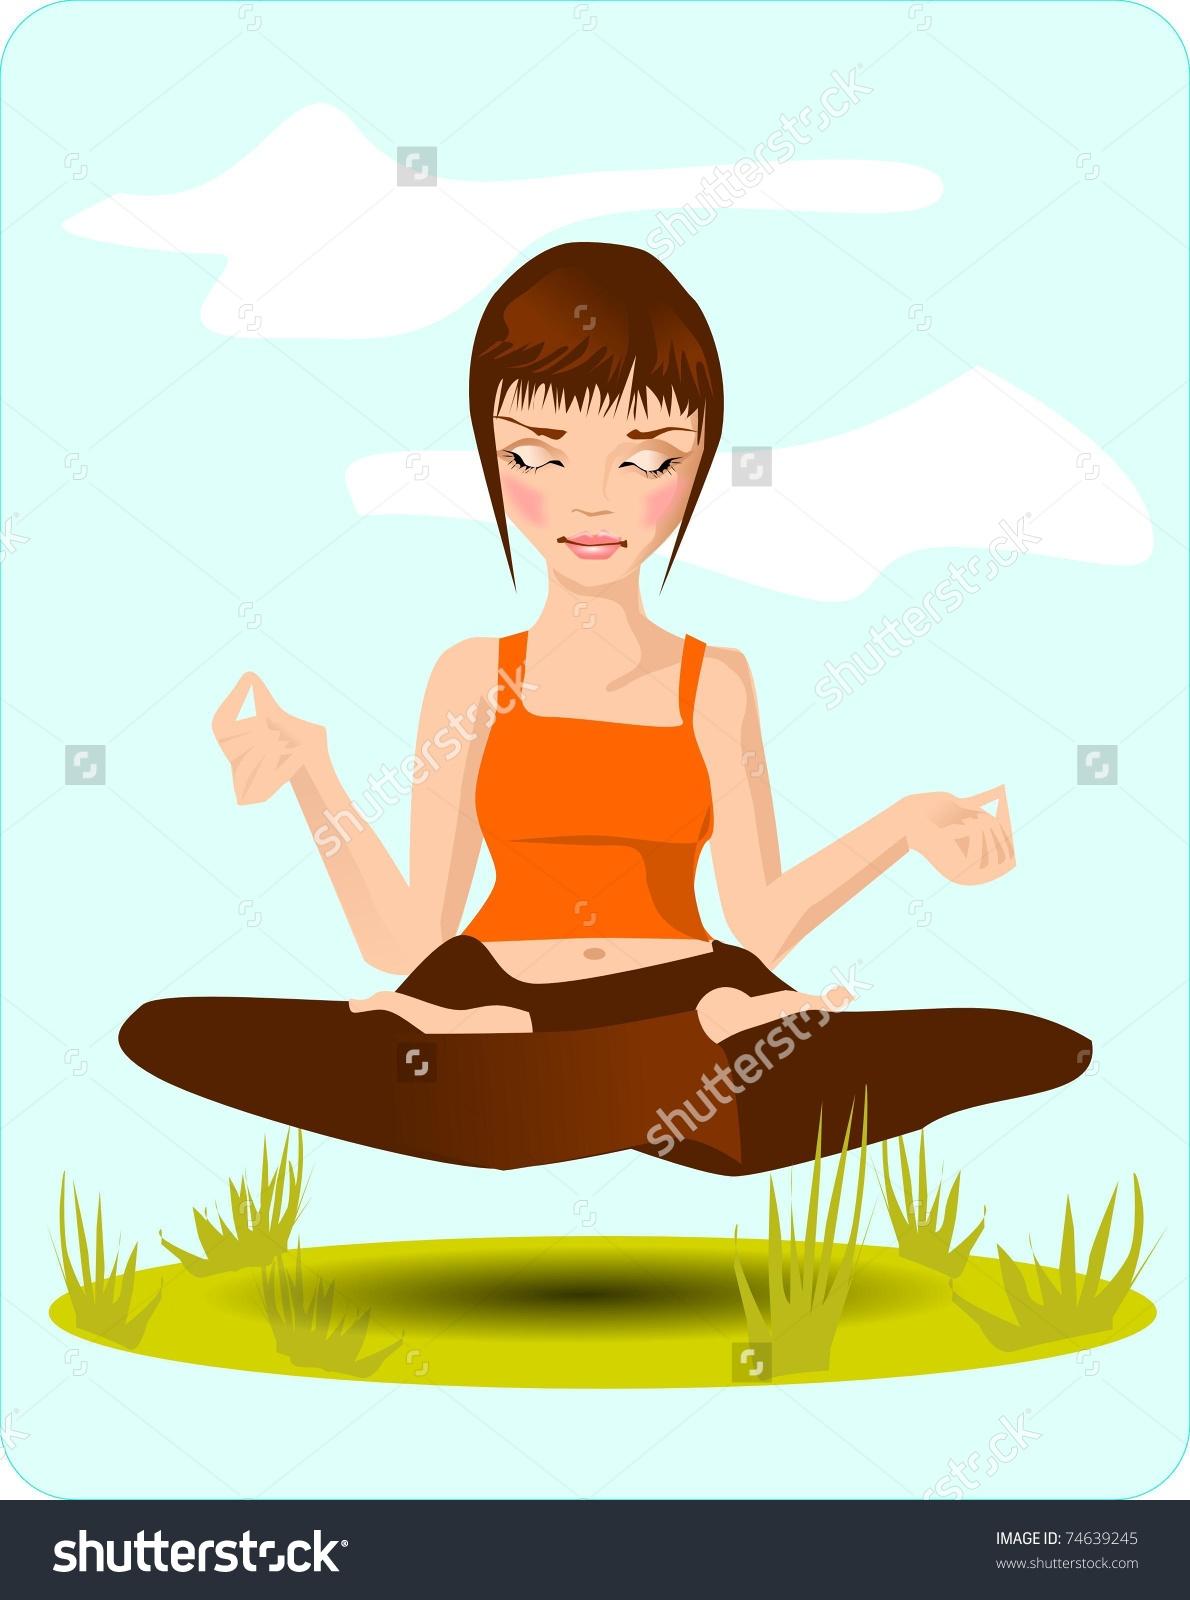 Meditation. Illustration Showing A Brooding Girl.